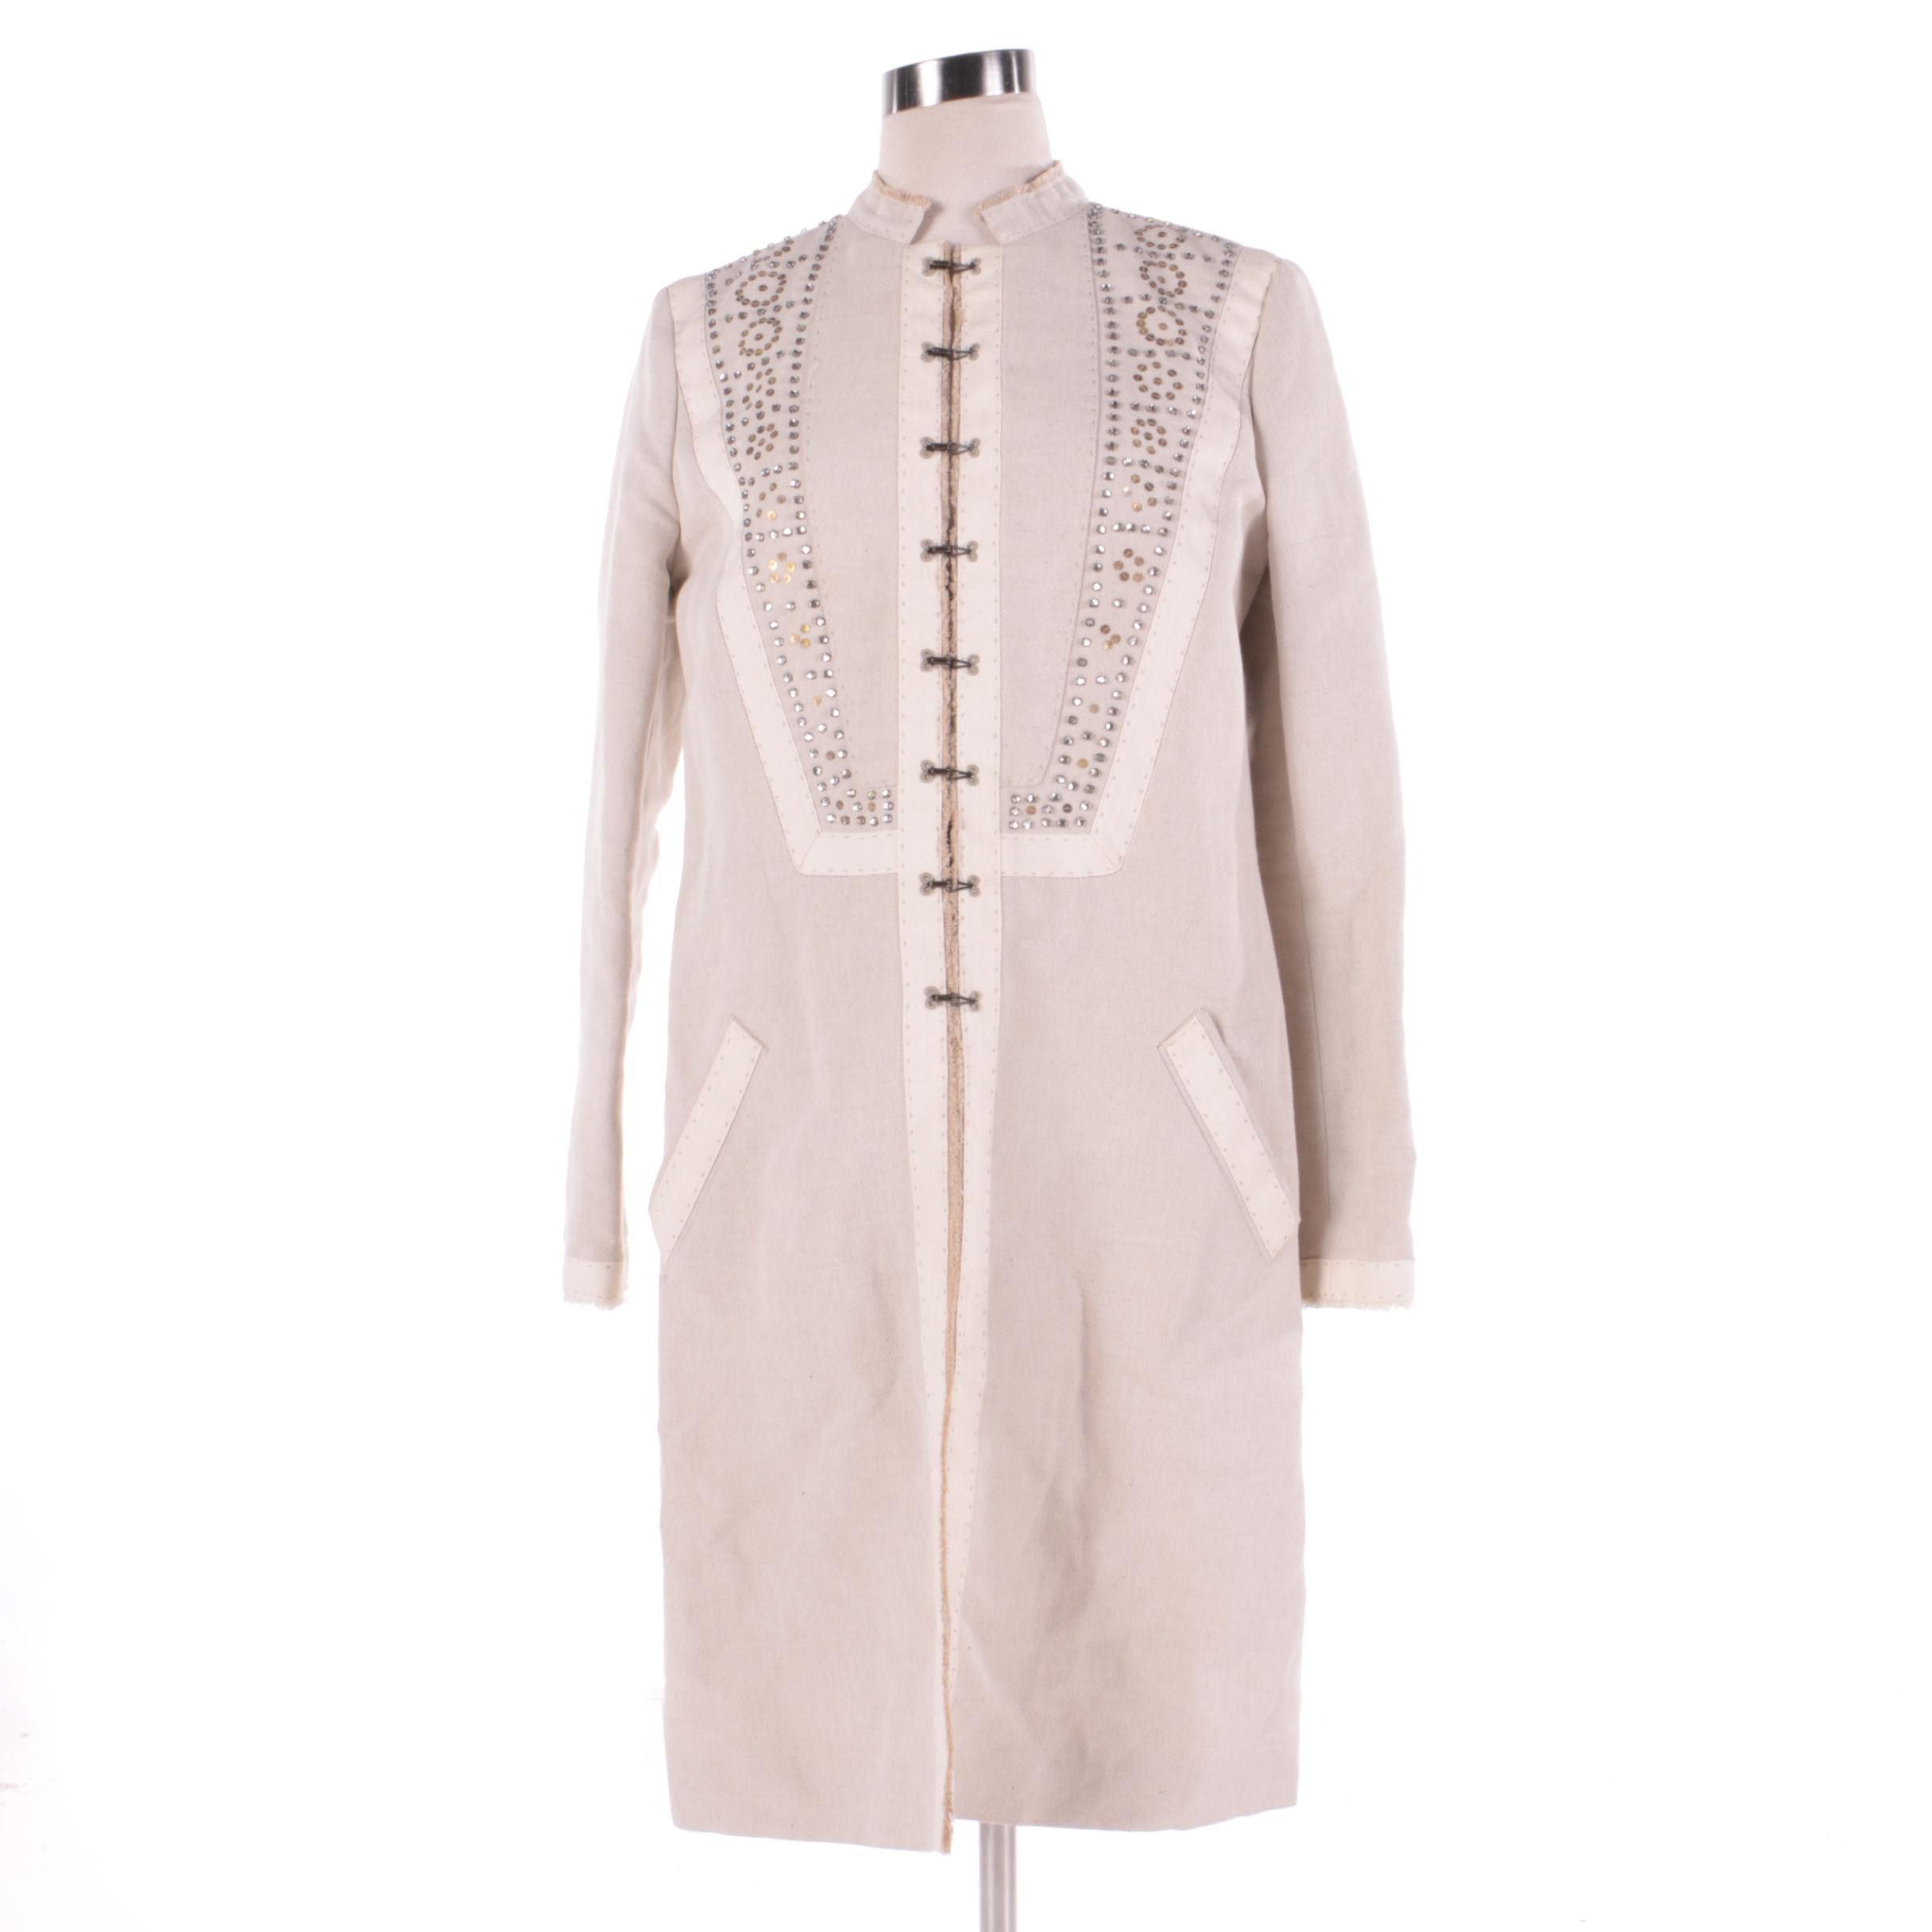 Women's Chloé Embellished Jacket